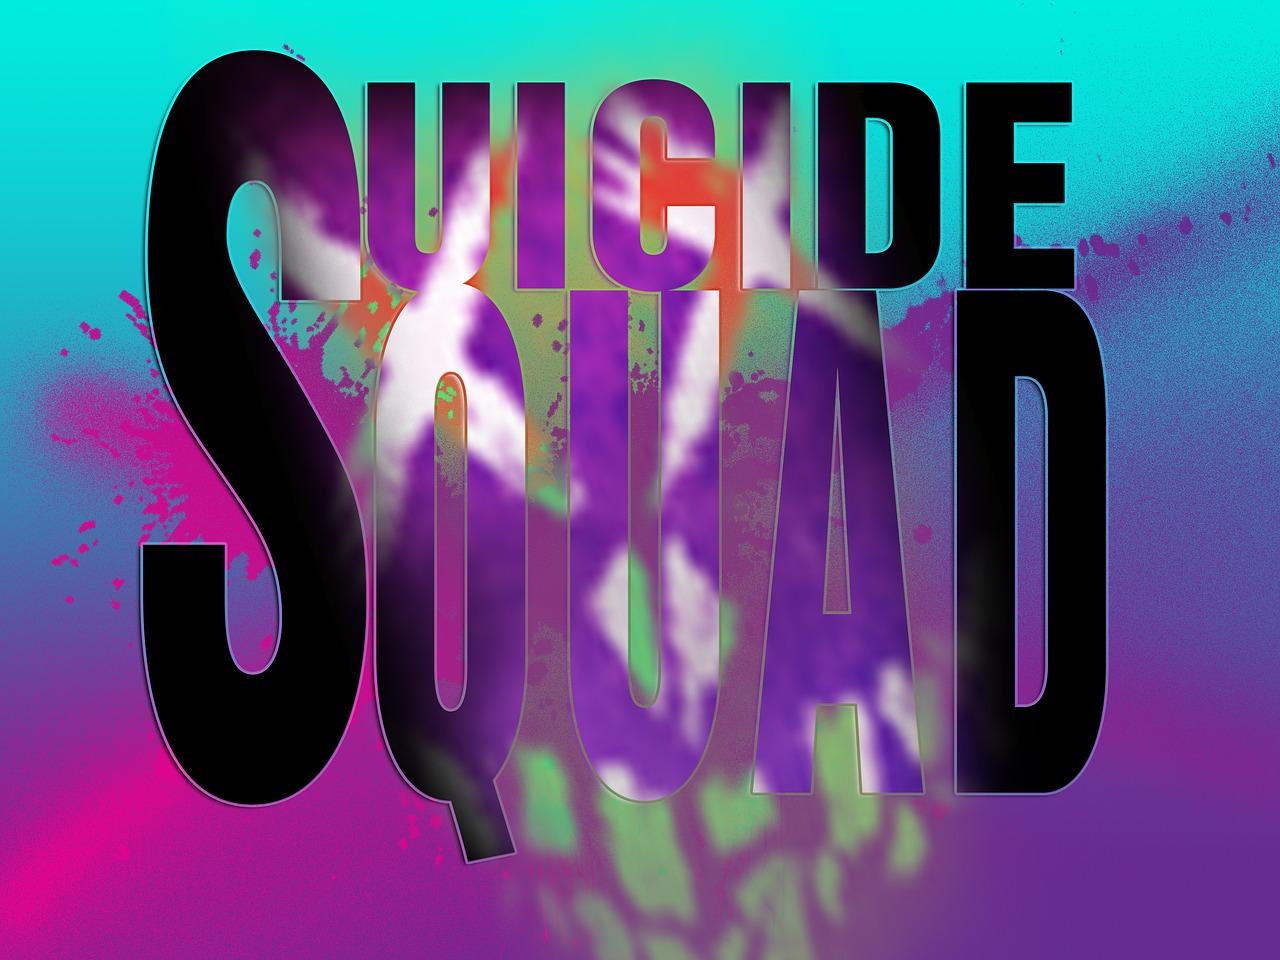 Dc Suicide Squad - Free image on Pixabay